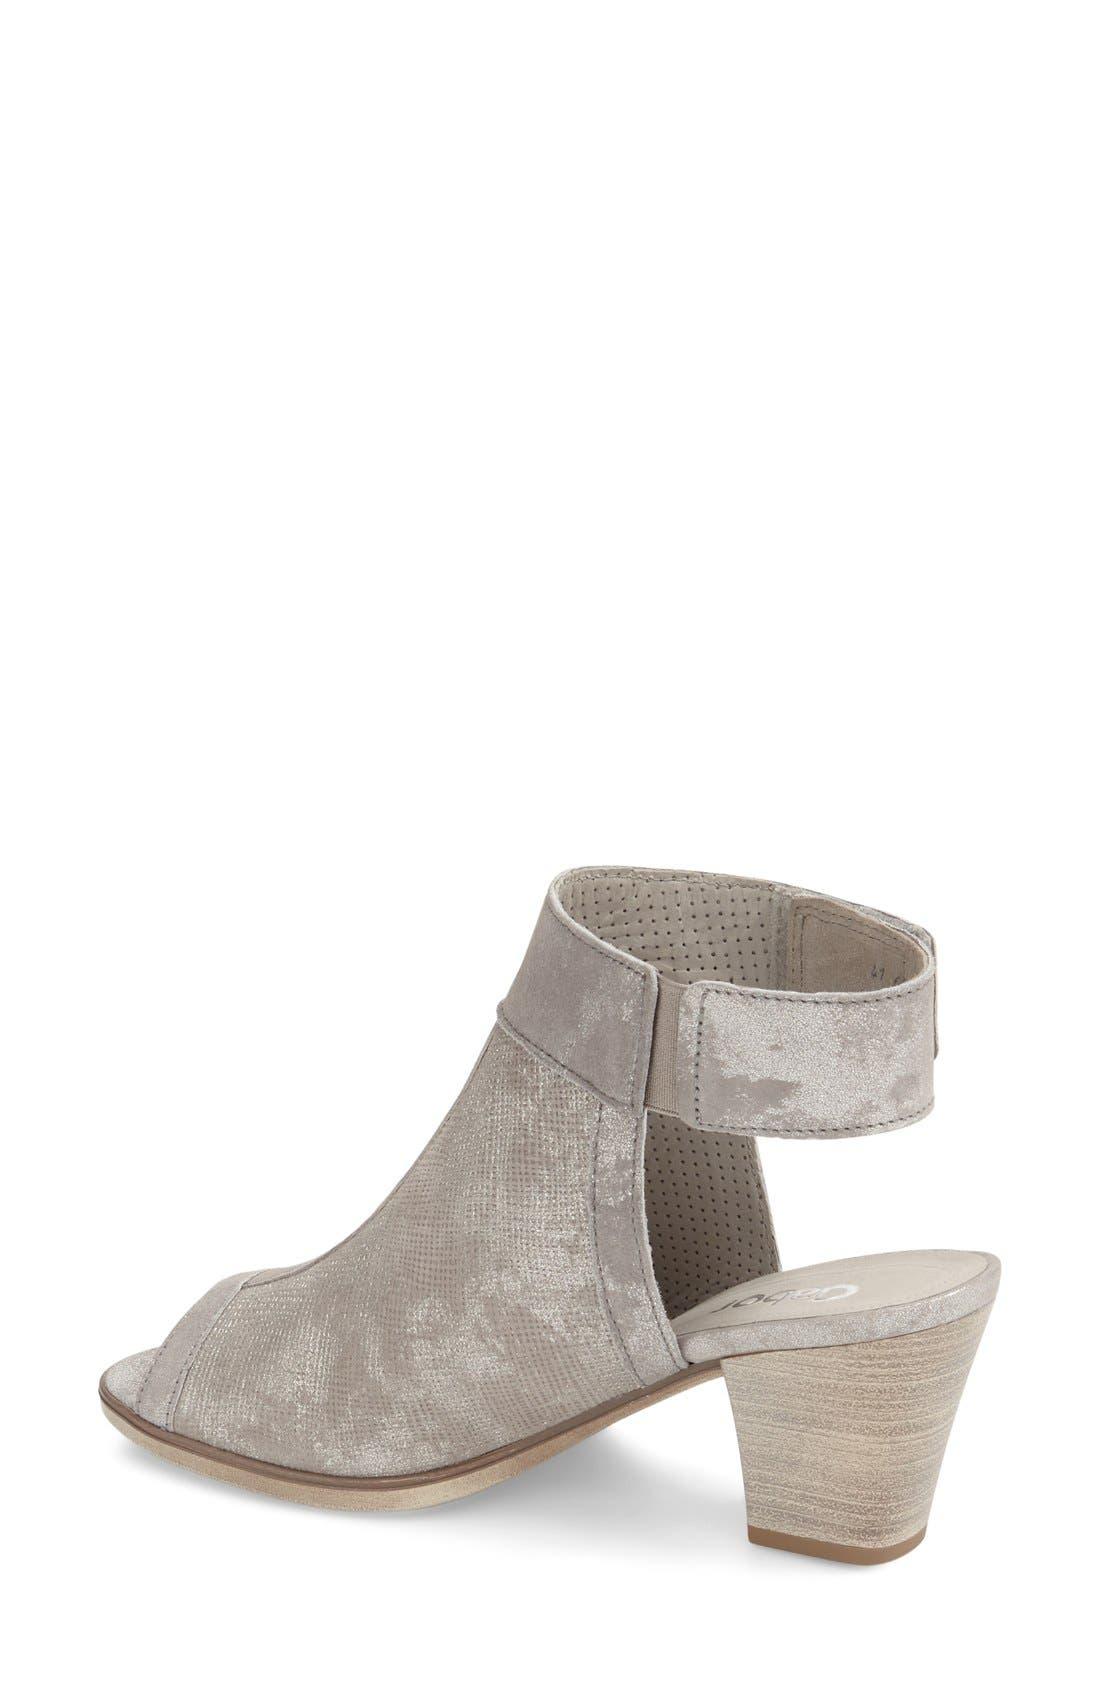 Open Toe Leather Sandal,                             Alternate thumbnail 2, color,                             040